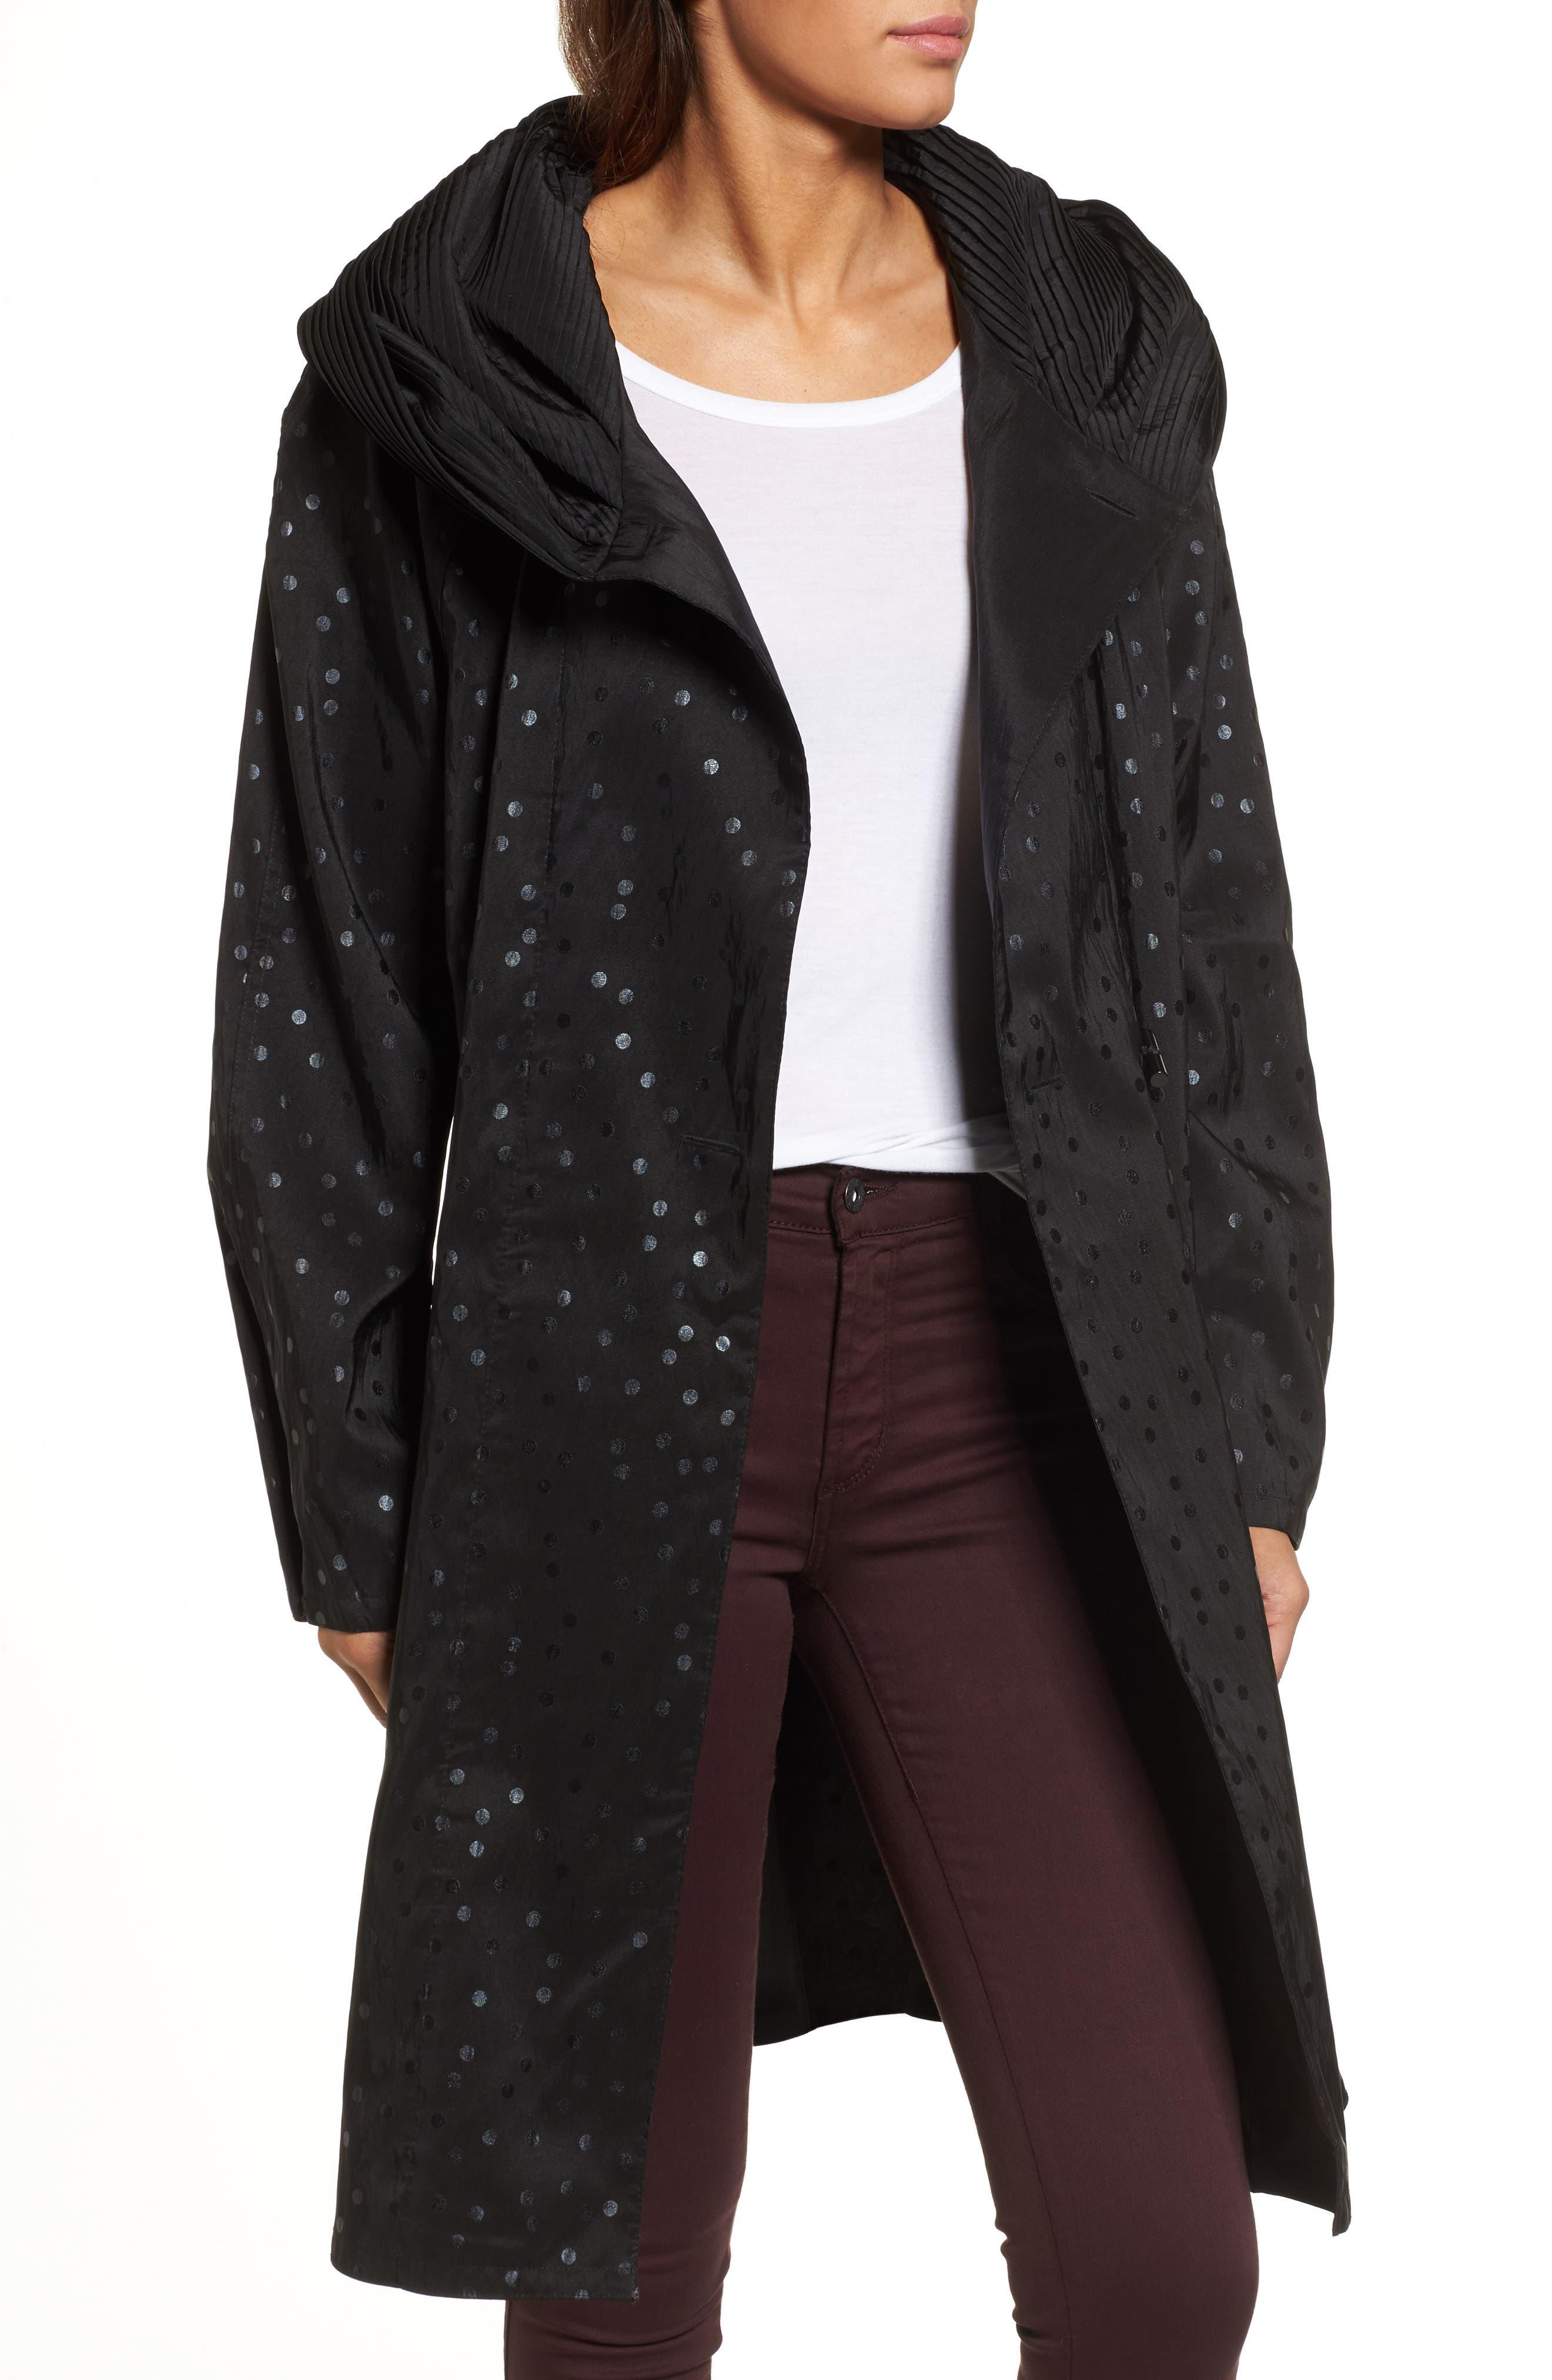 Alternate Image 1 Selected - Mycra Pac Designer Wear 'Donatella' Reversible Dot Pleat Hood Packable Travel Coat